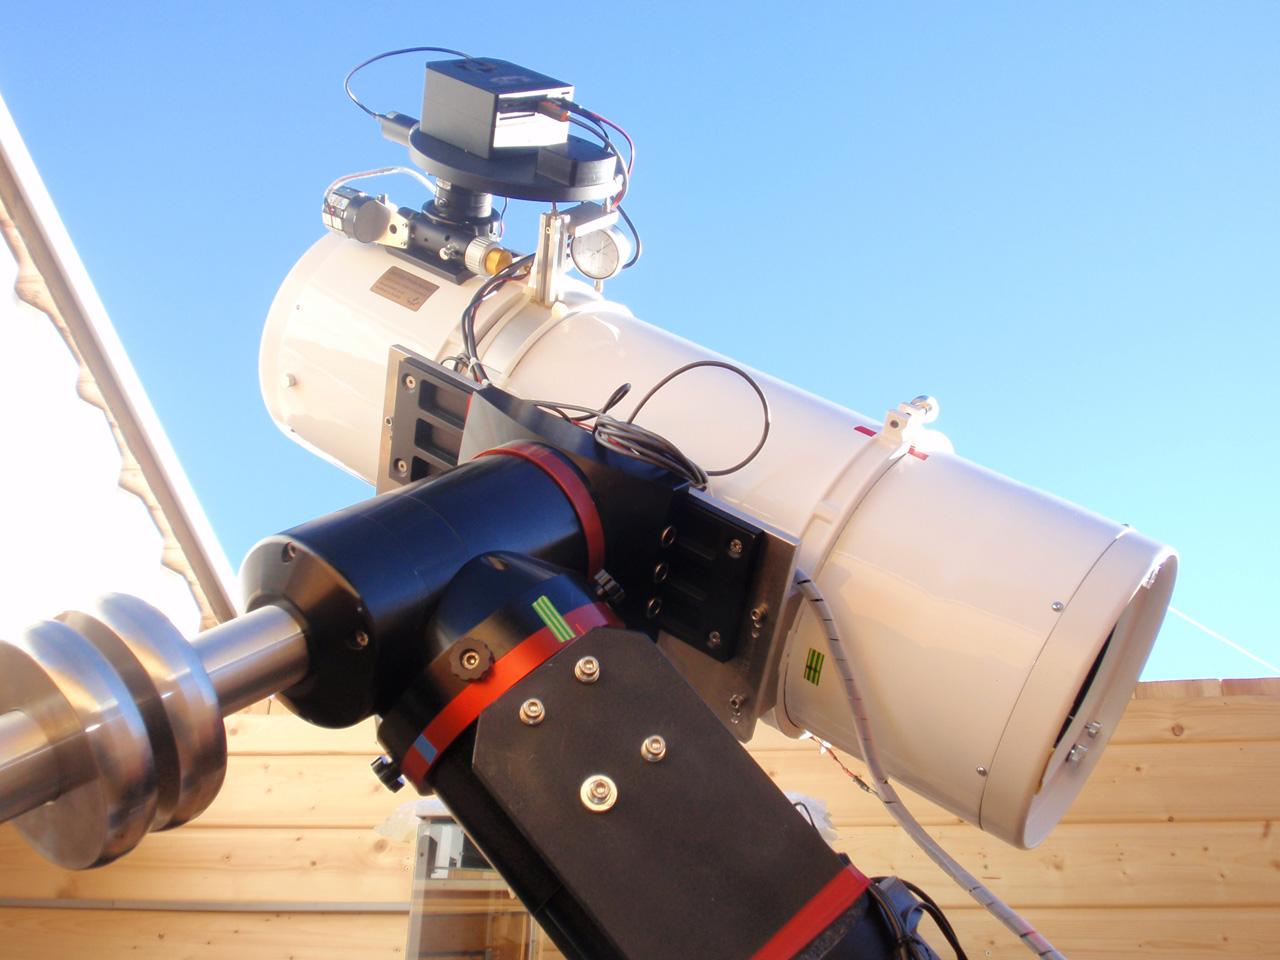 Teleskop newton: newton teleskop ebay kleinanzeigen. celestron goto